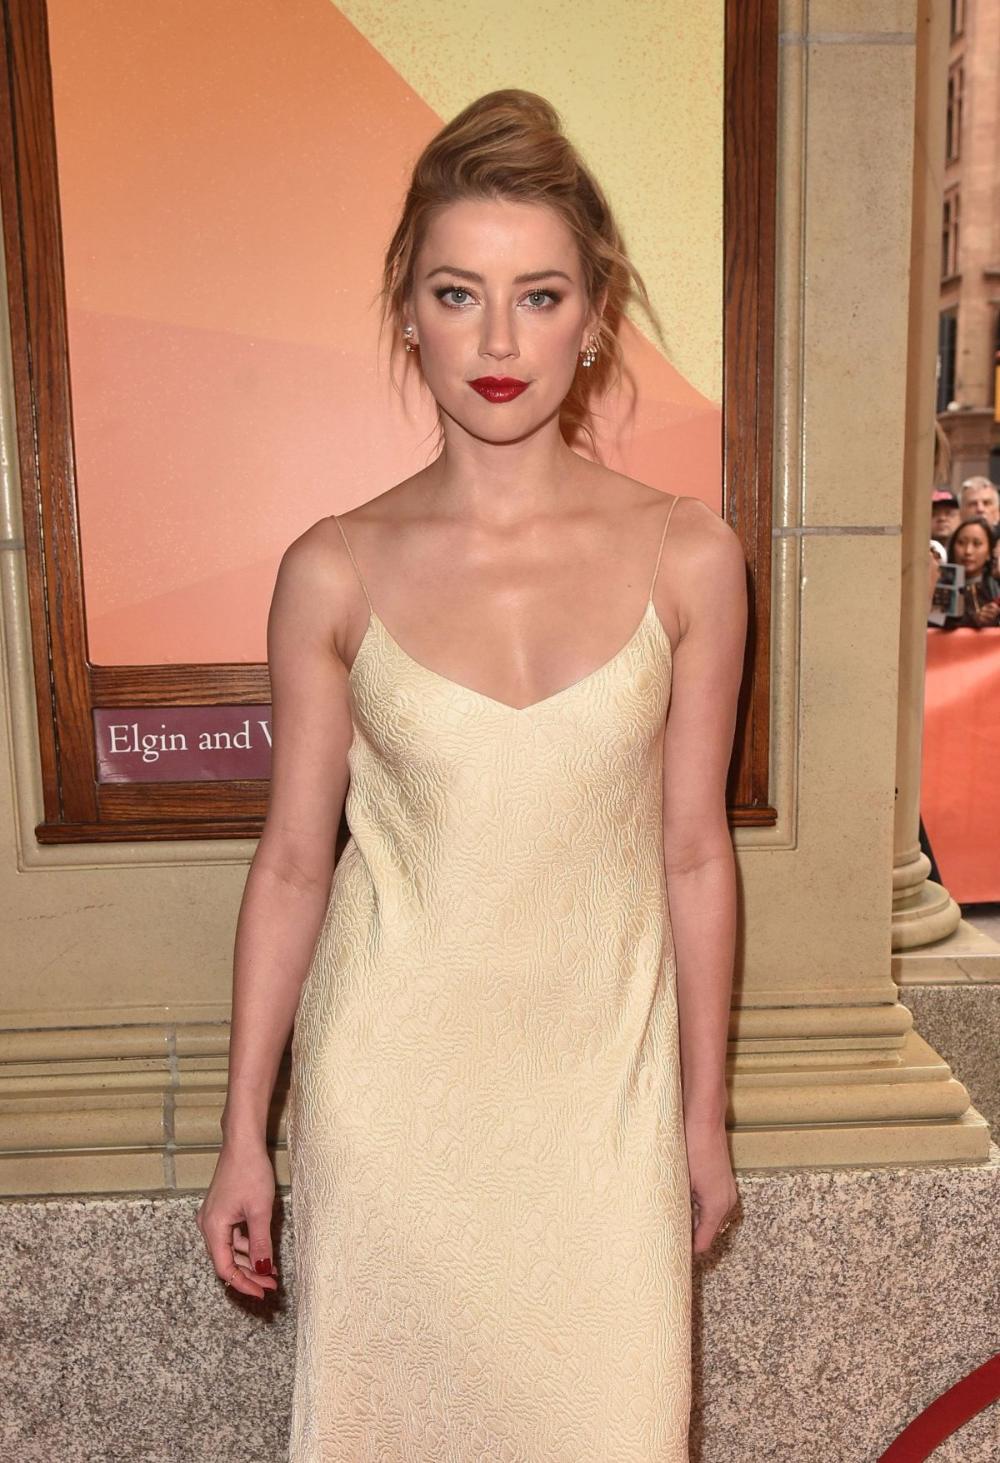 Amber Heard Photo Gallery In 2020 Amber Heard Amber Heard Photos Amber Heard Style